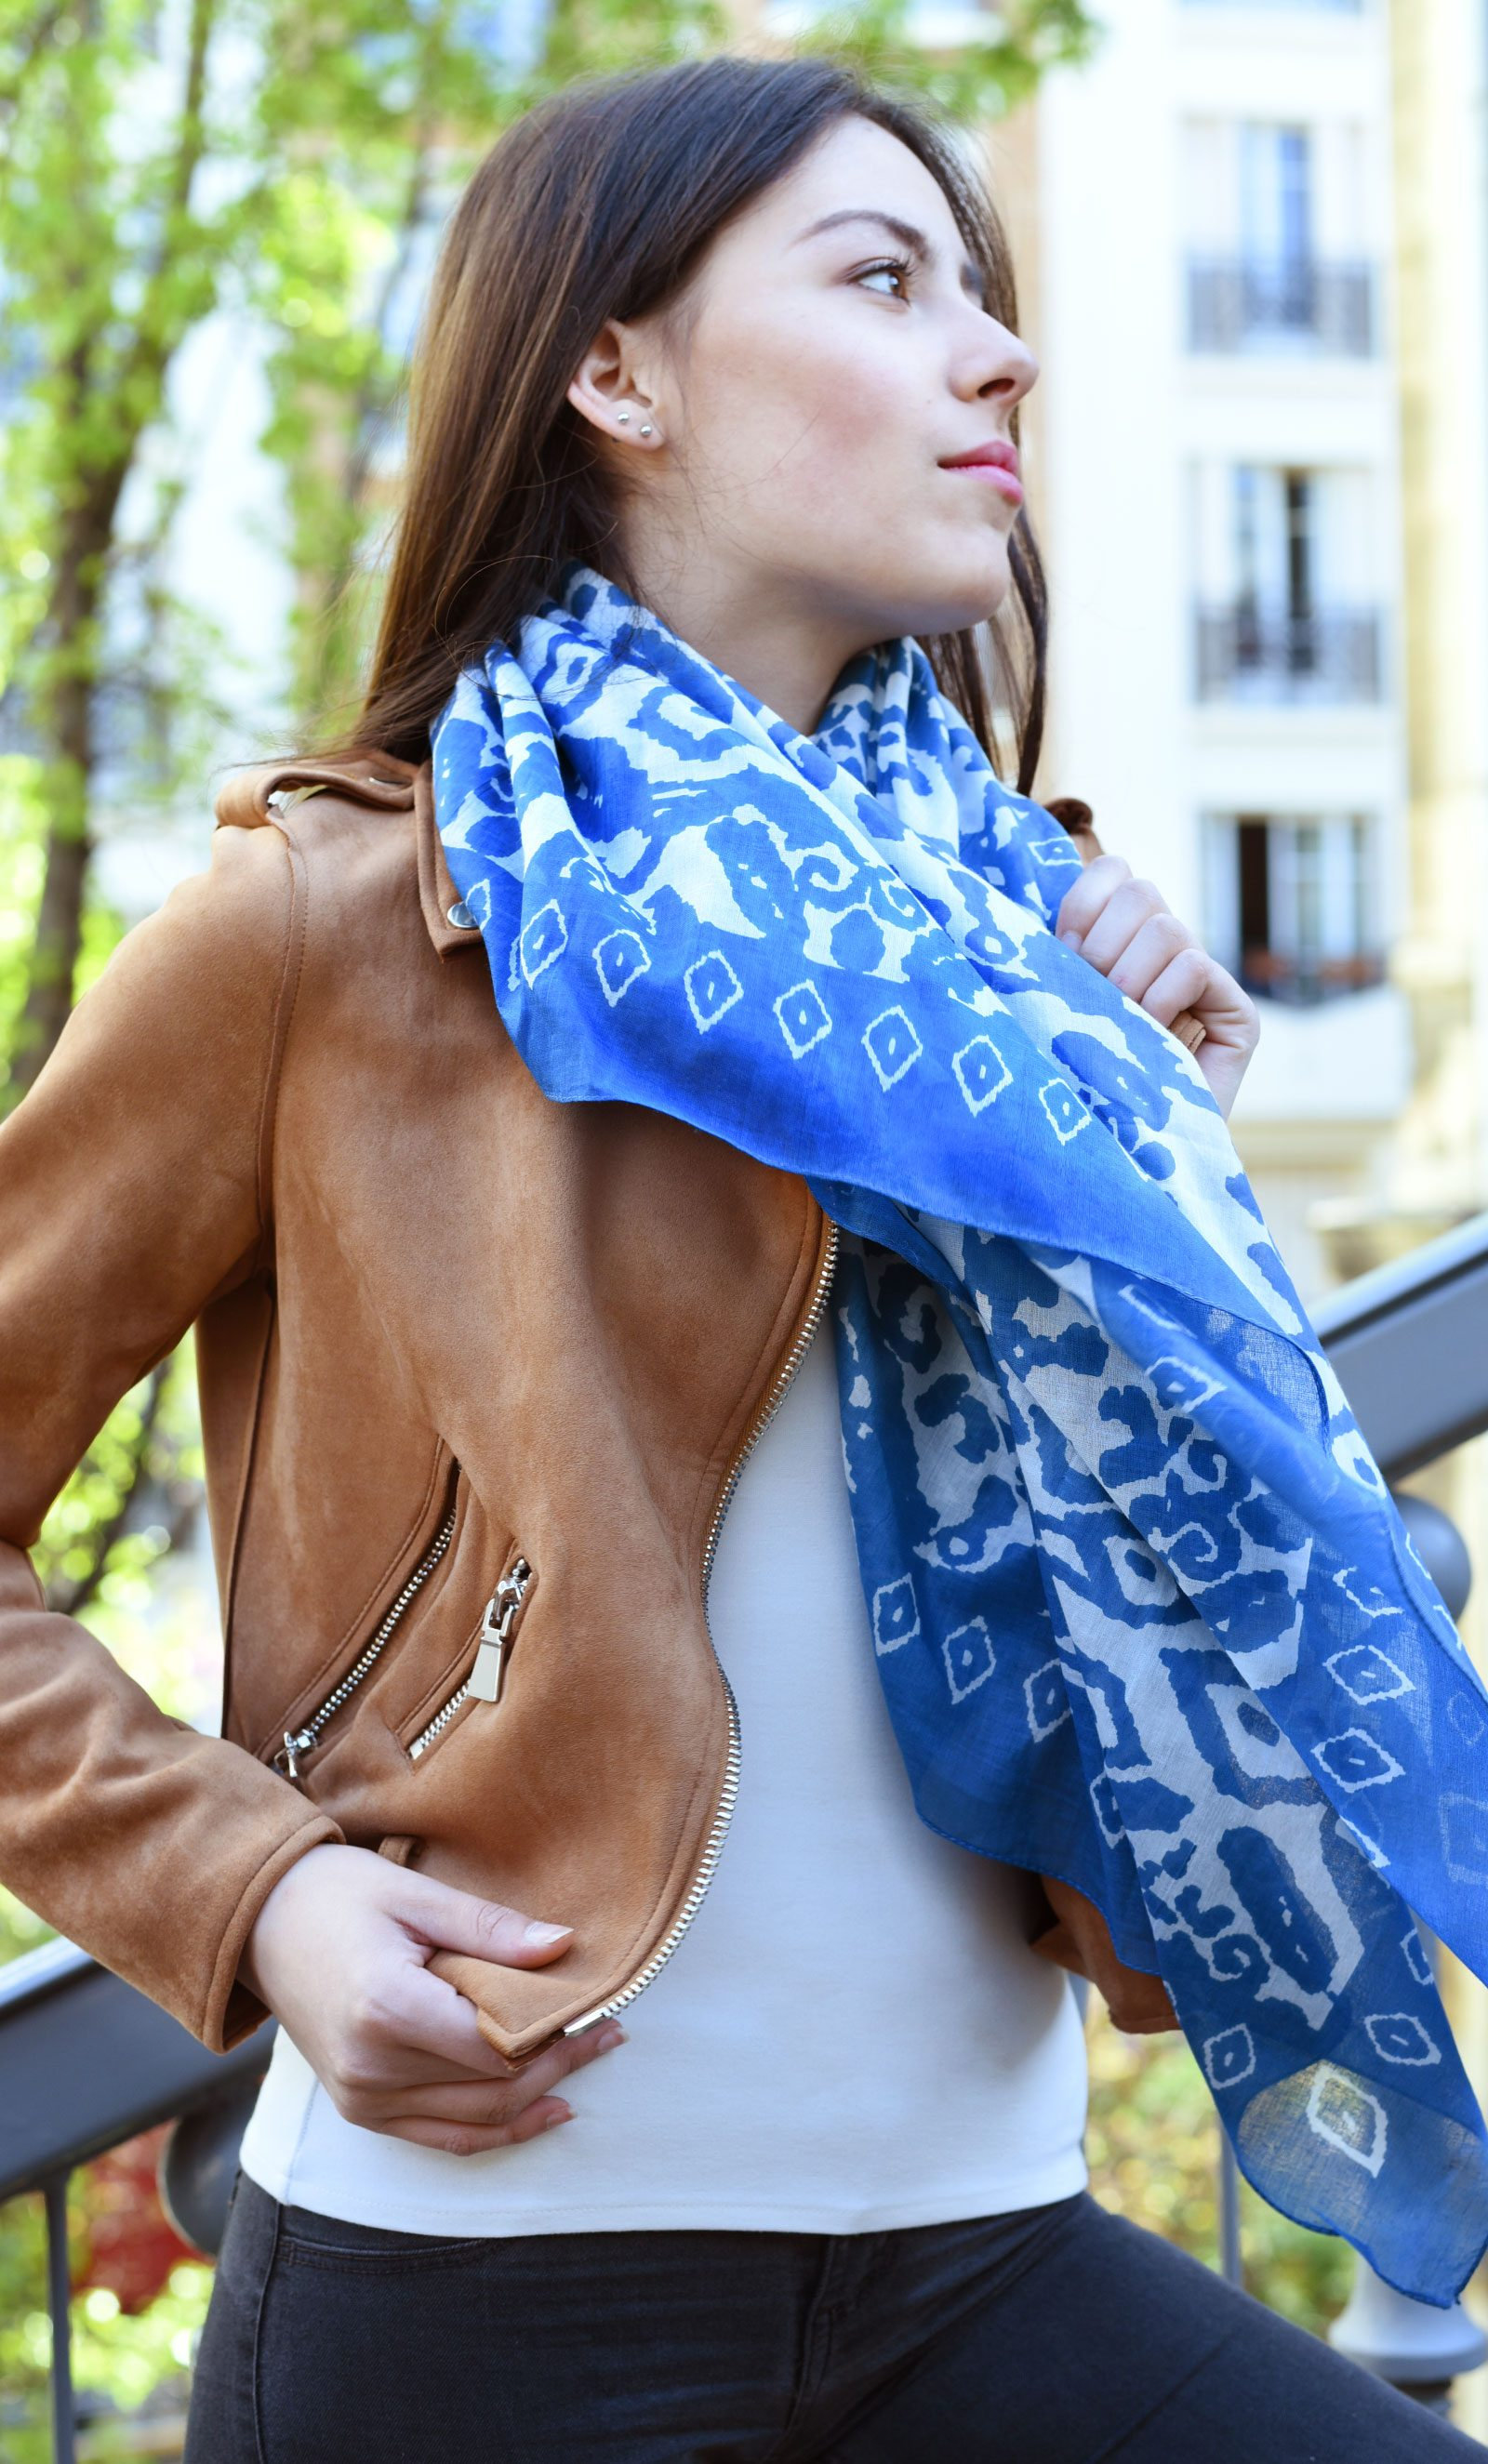 http://lookbook.allee-du-foulard.fr/wp-content/uploads/2018/05/0662-ADF-Accessoires-de-mode-LB-Coll-ethnique-etnia-bleu-2-1600x2650.jpg